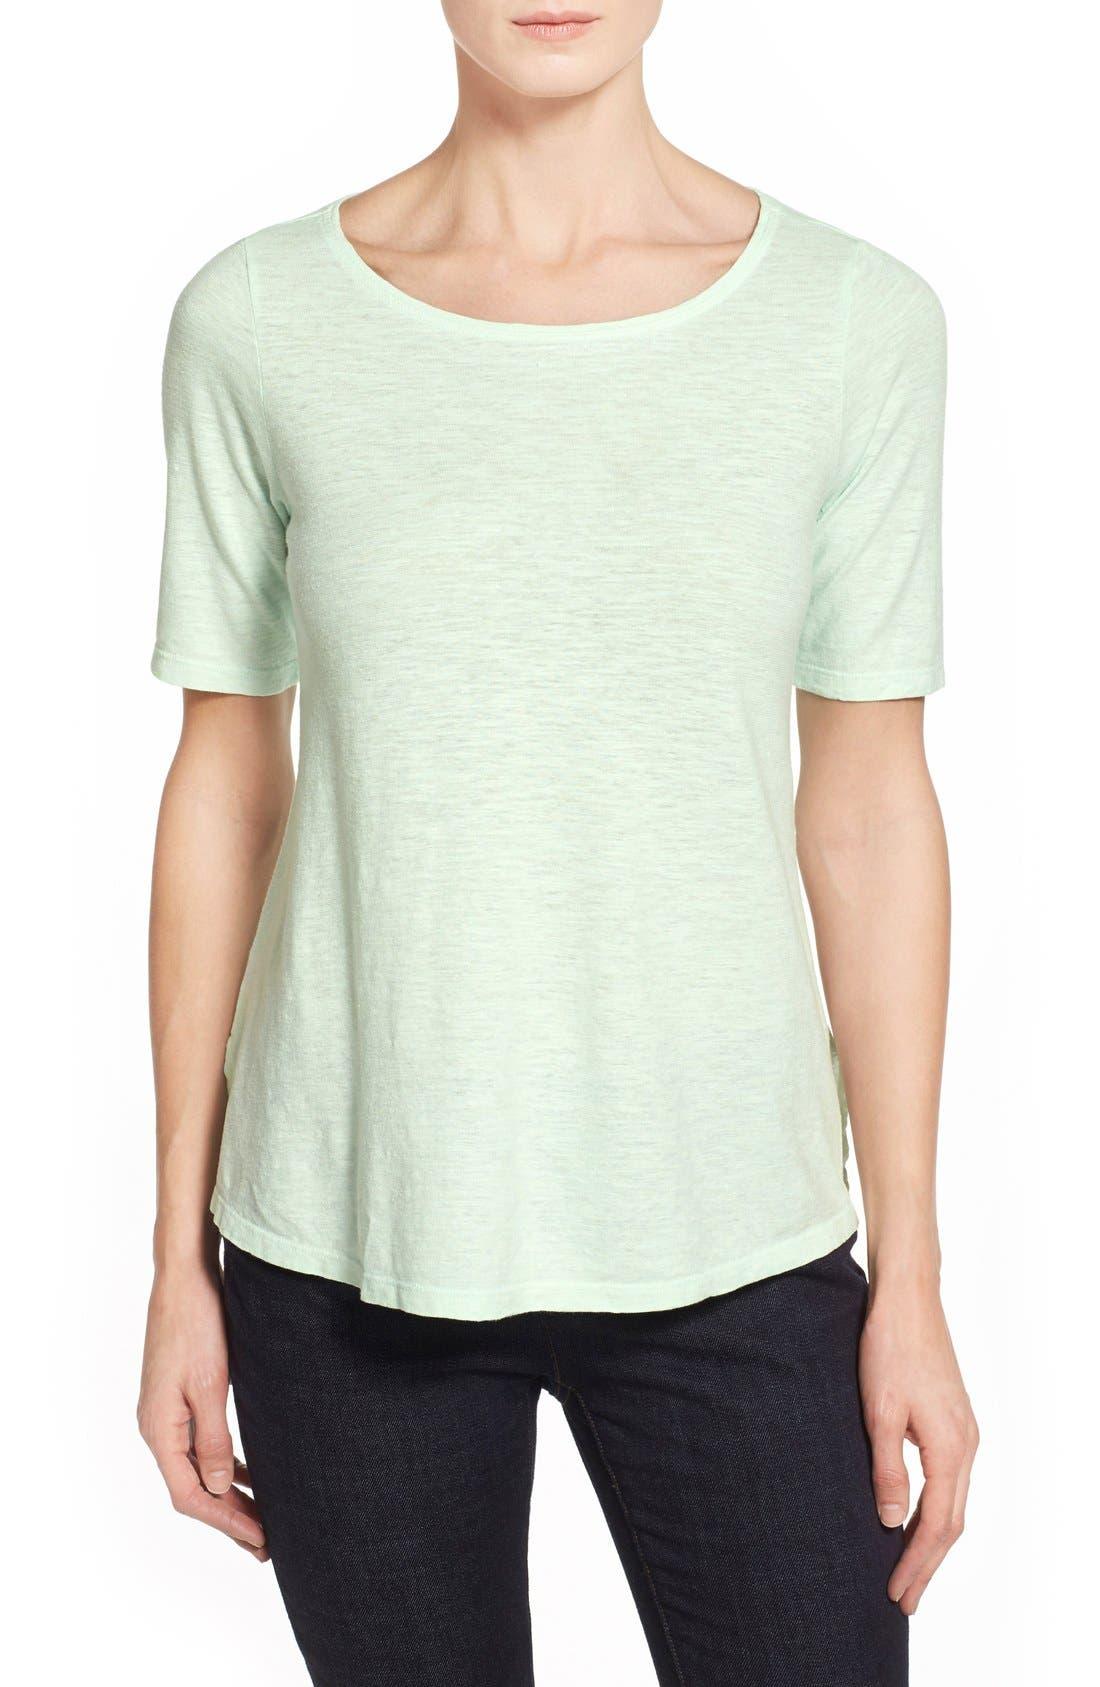 Alternate Image 1 Selected - Eileen Fisher Hemp & Organic Cotton Top (Regular & Petite)